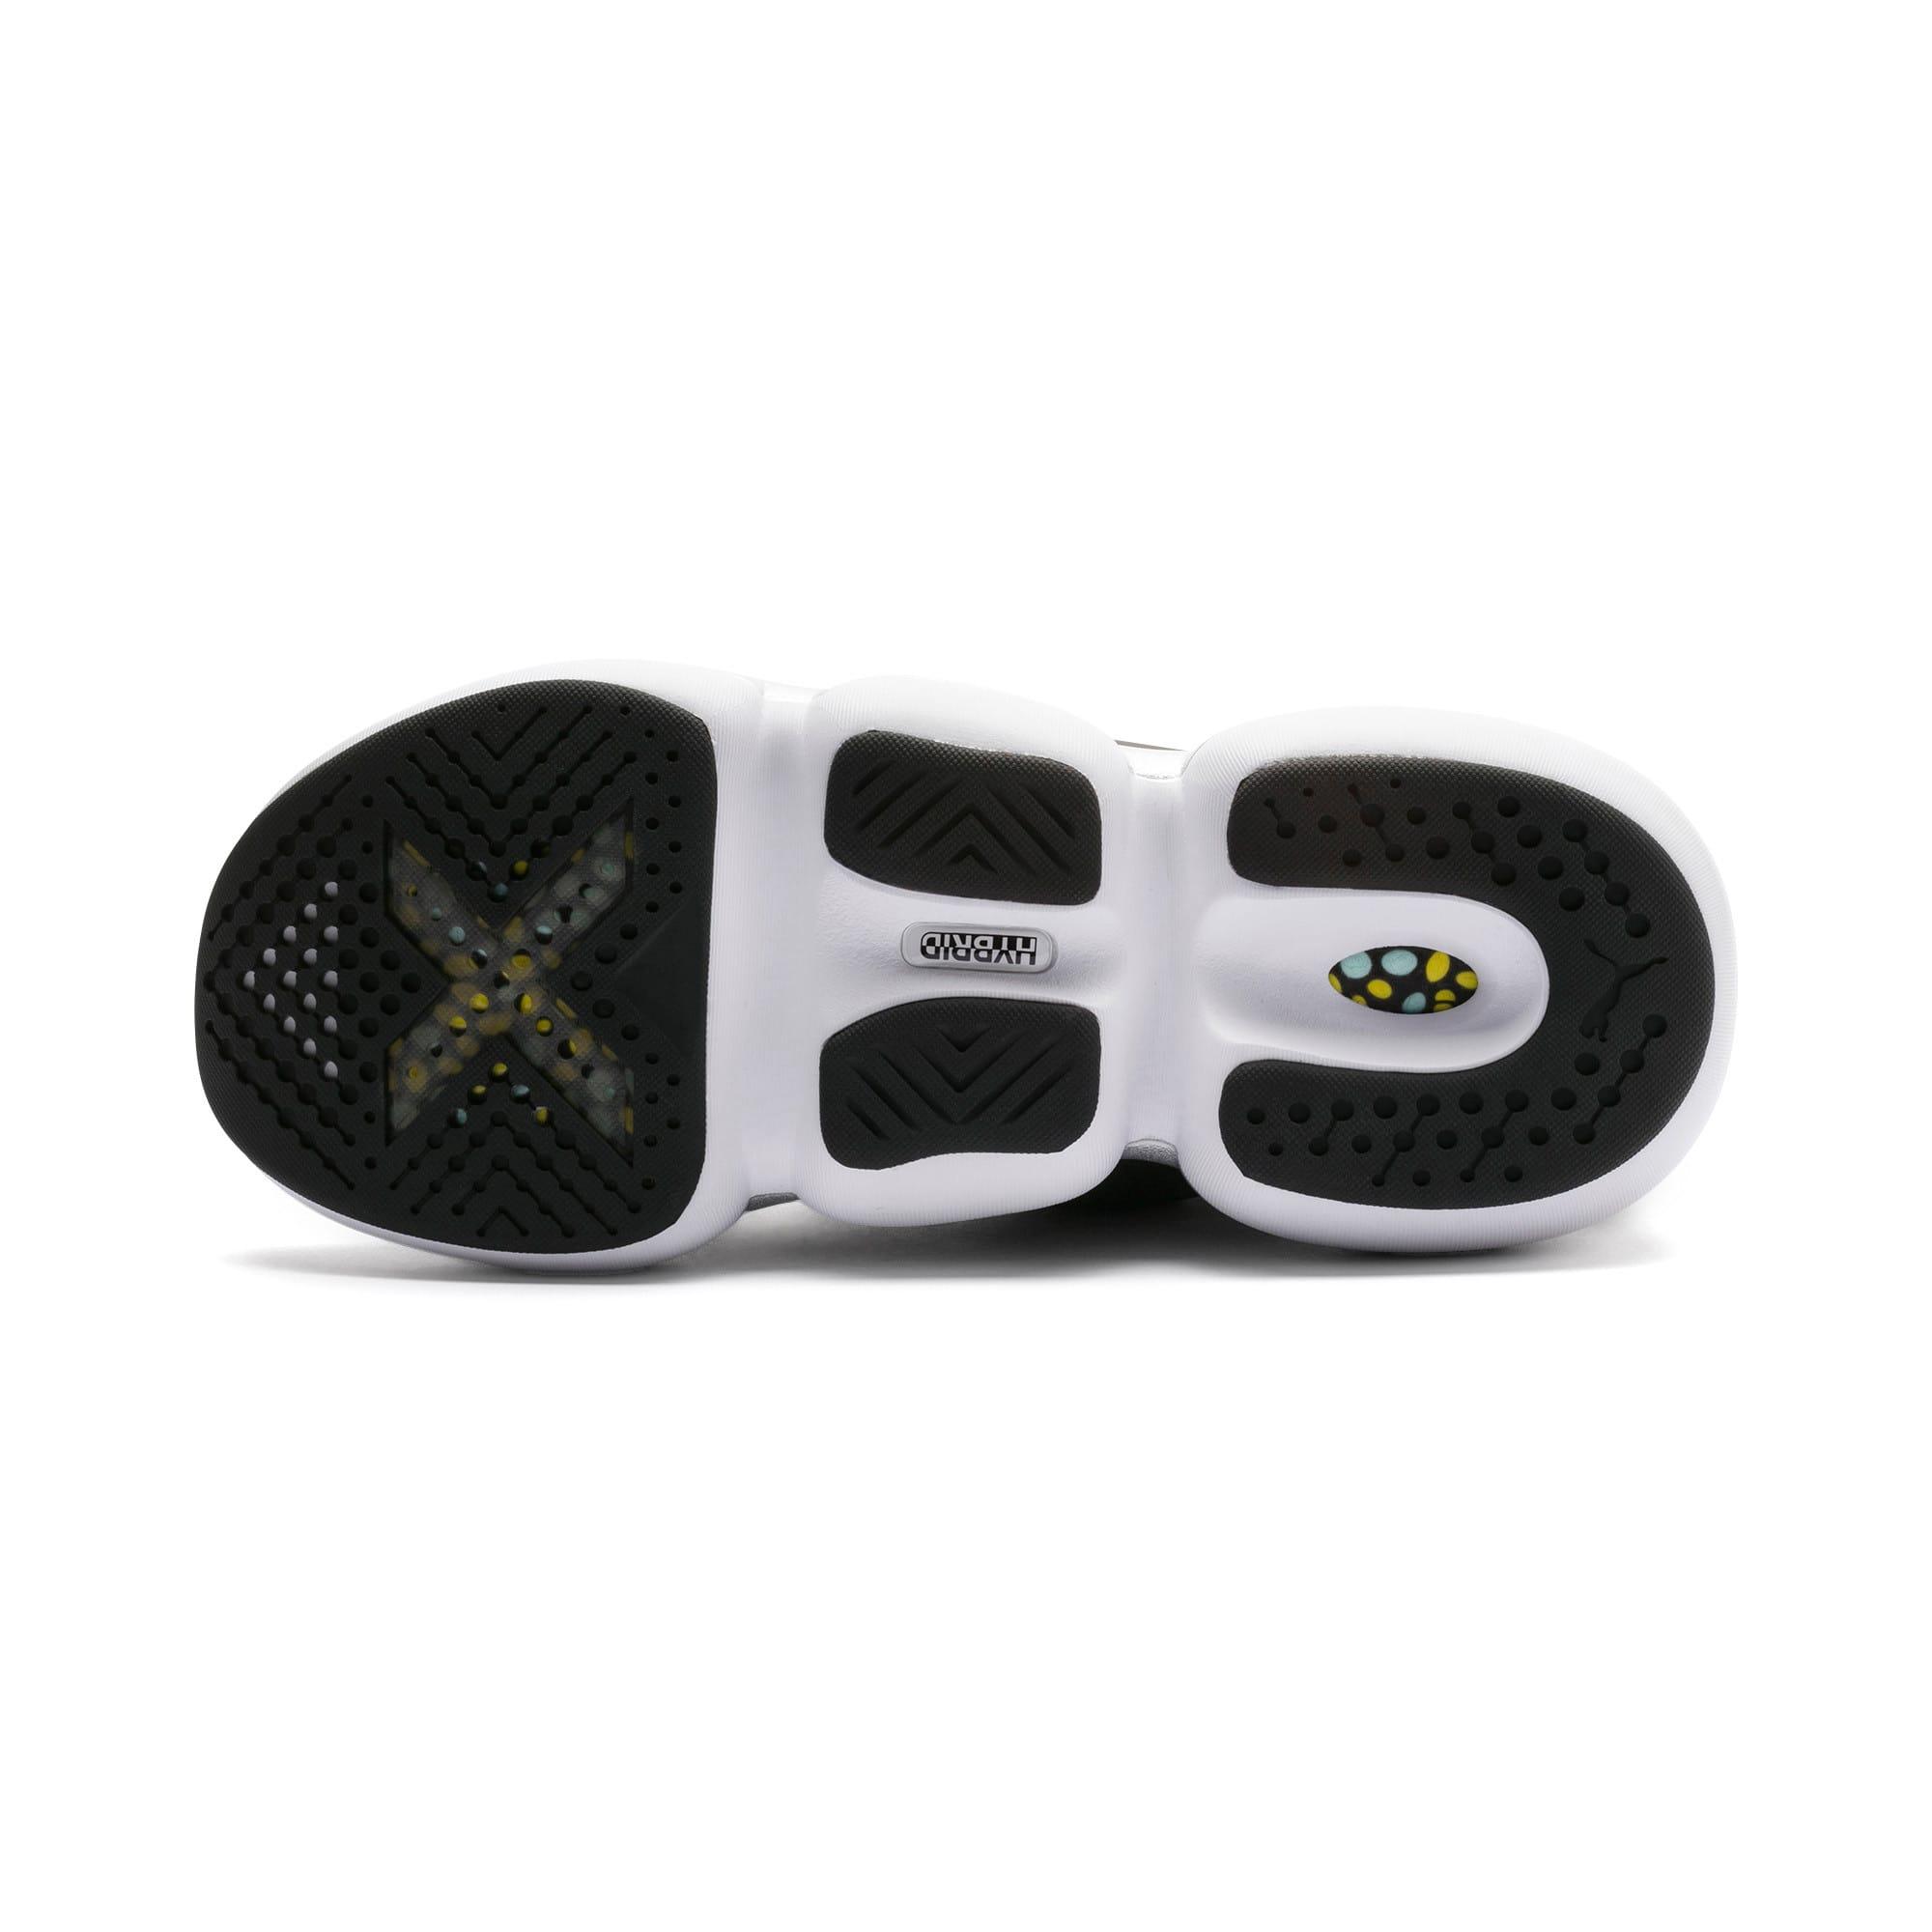 Thumbnail 5 of Mode XT Women's Training Shoes, Puma Black-Puma White, medium